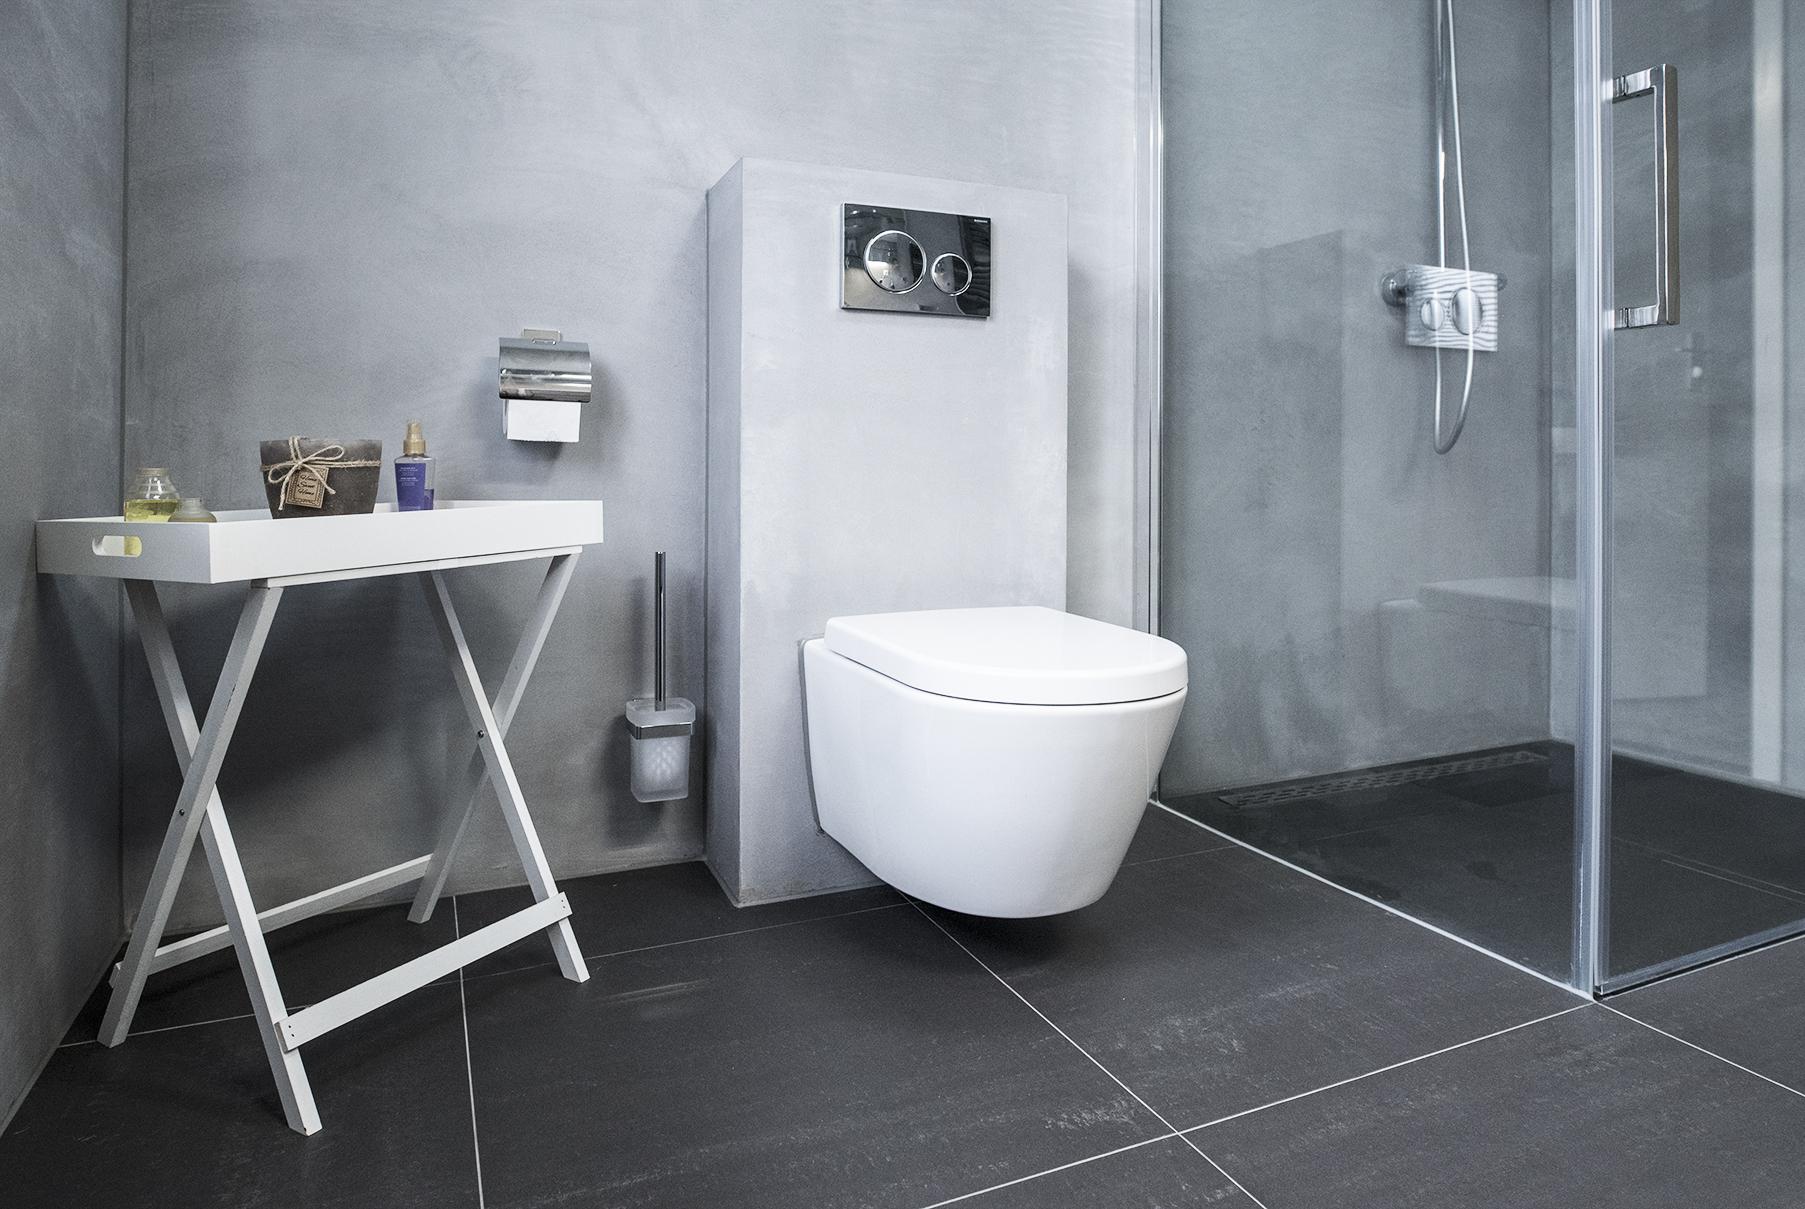 Betonstuc badkamer kosten beton cire ervaringen